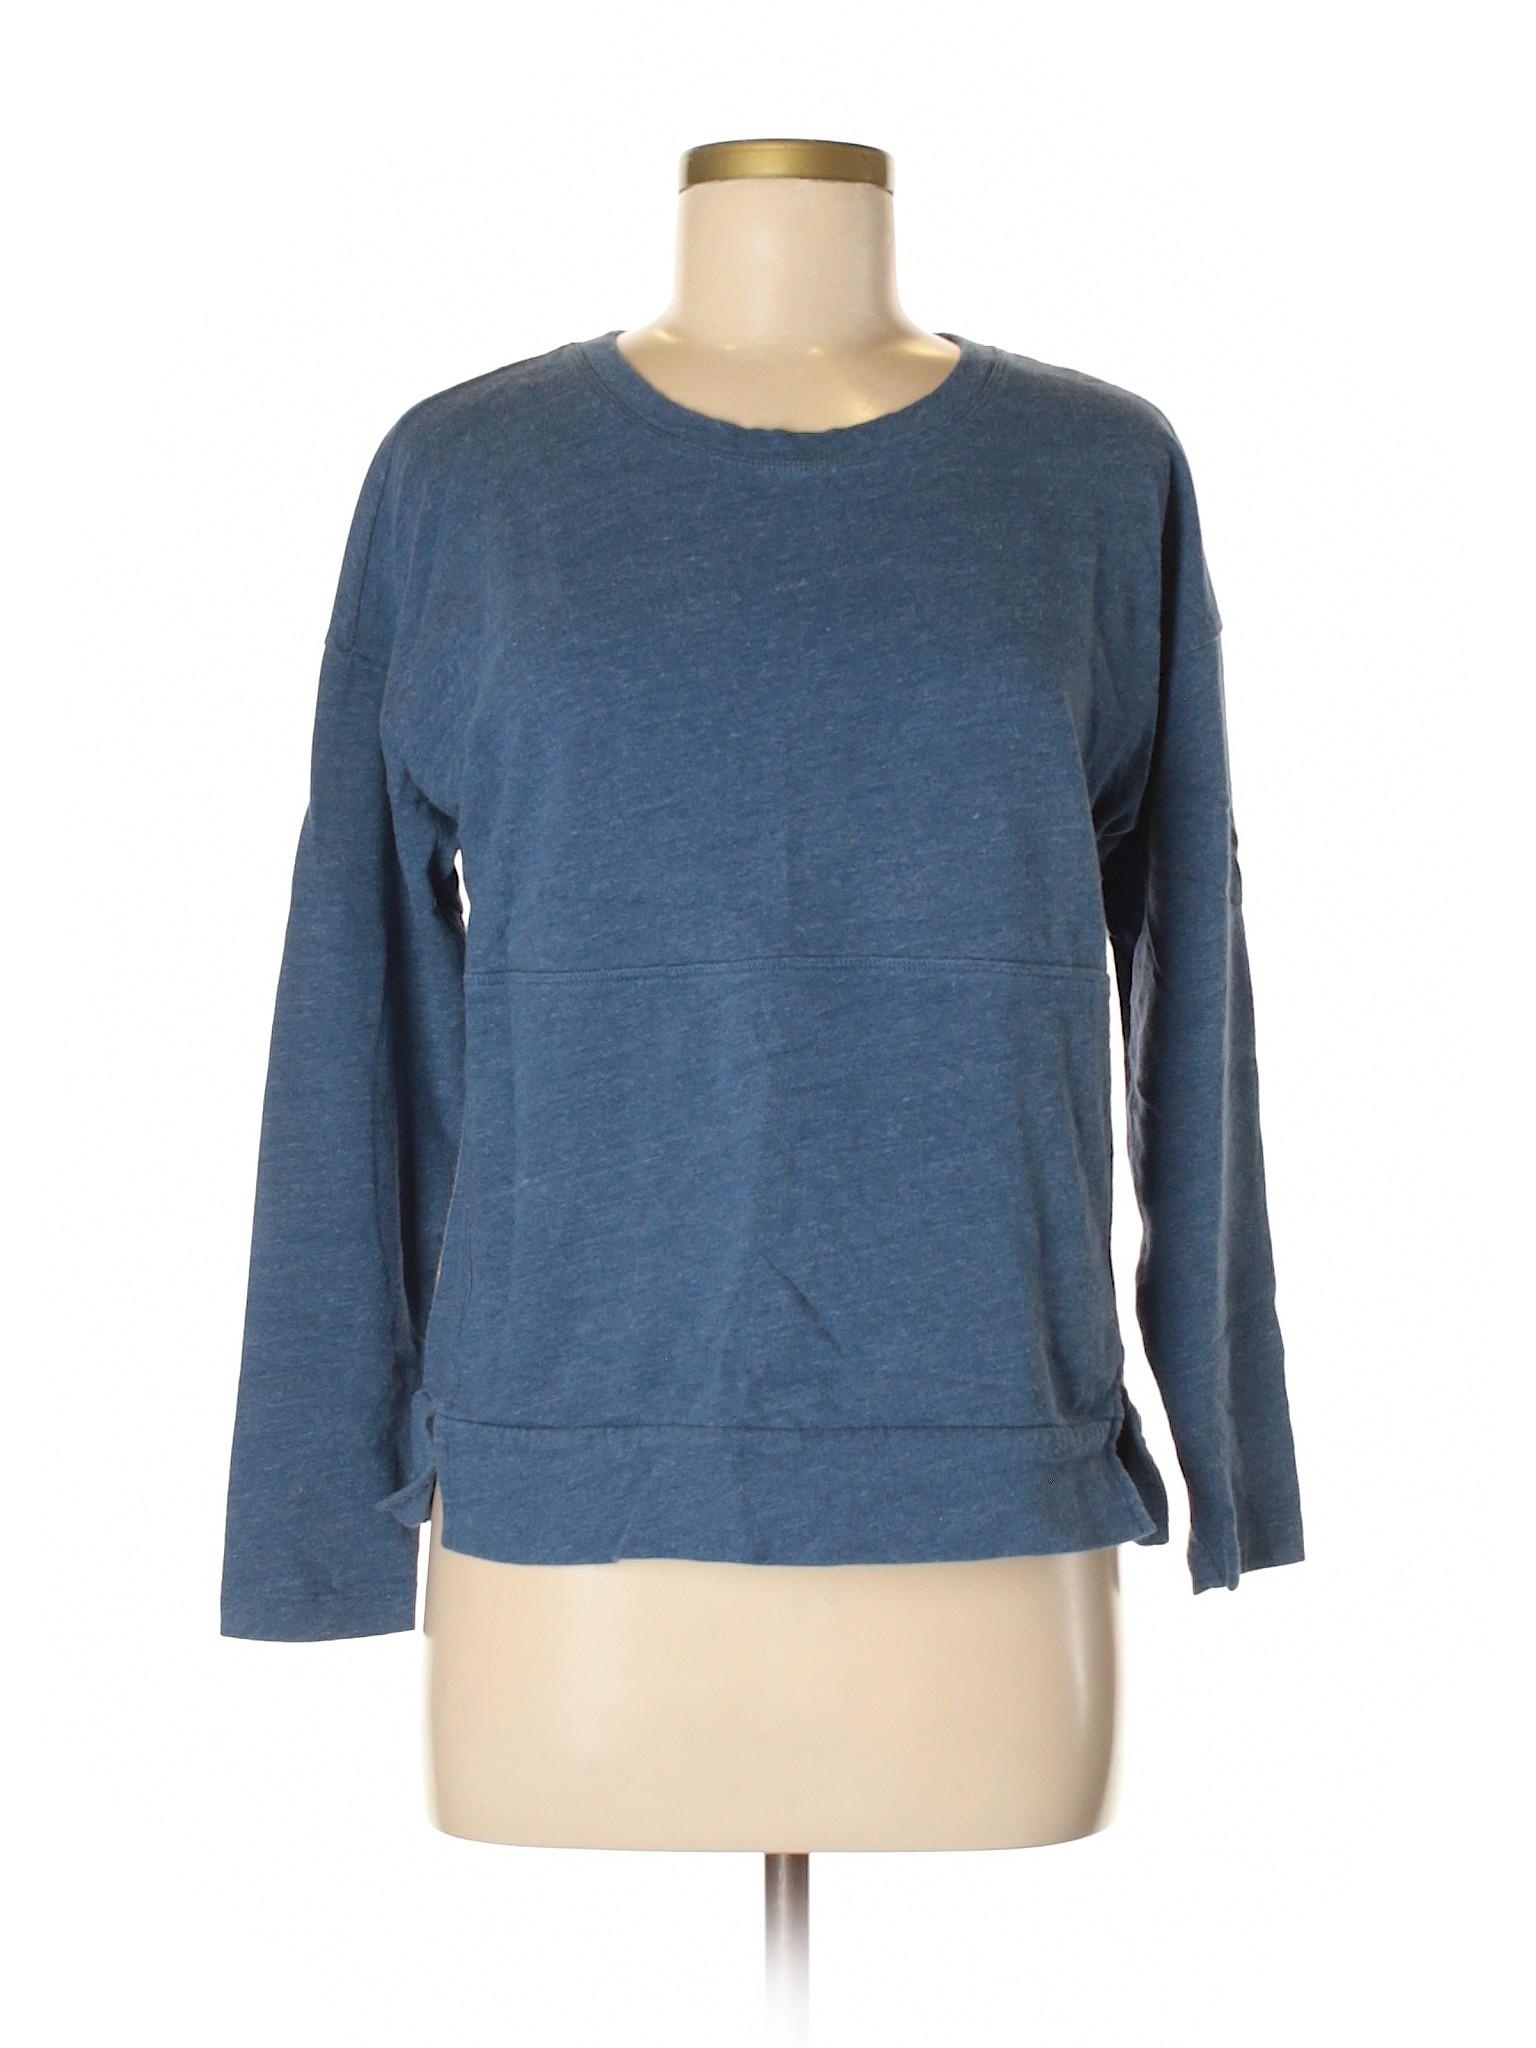 Boutique Gap Gap Boutique Sweater Gap Boutique Pullover Sweater Gap Boutique Sweater Pullover Pullover Sweater Boutique Pullover TSxYqfqw